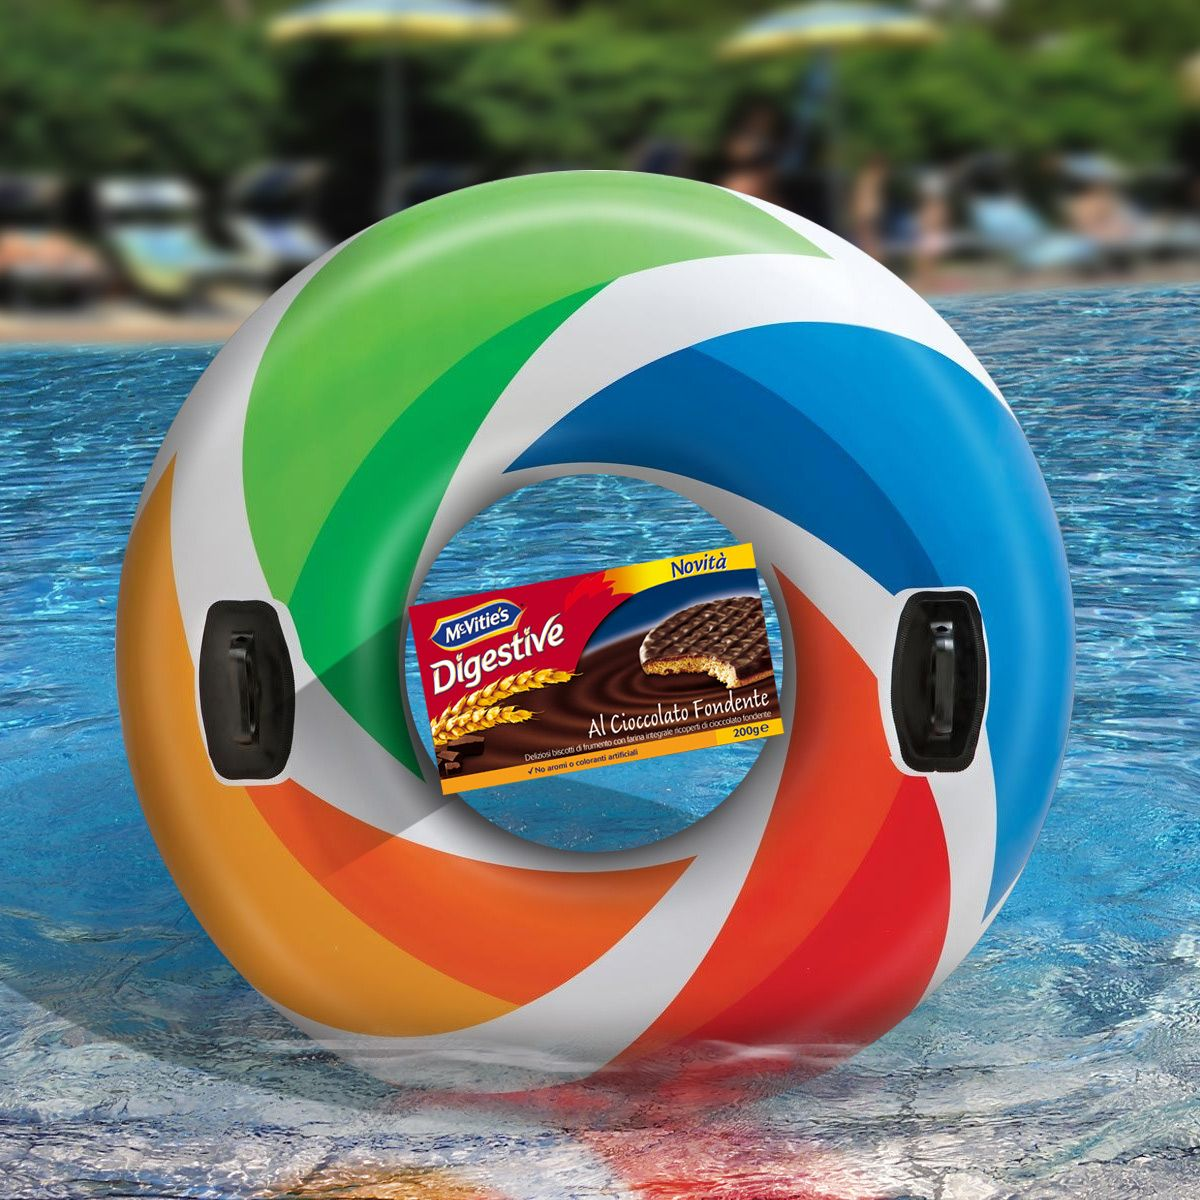 #mcvitiesitalia #mcvitiesdigestive #mcvitiescioccolatofondente #mcvities #giambella #piscina #summer #estate #divertimento #vacanze #holidays #food #cibo #sweet #dolce #biscuits #biscotto #nuotare #relax